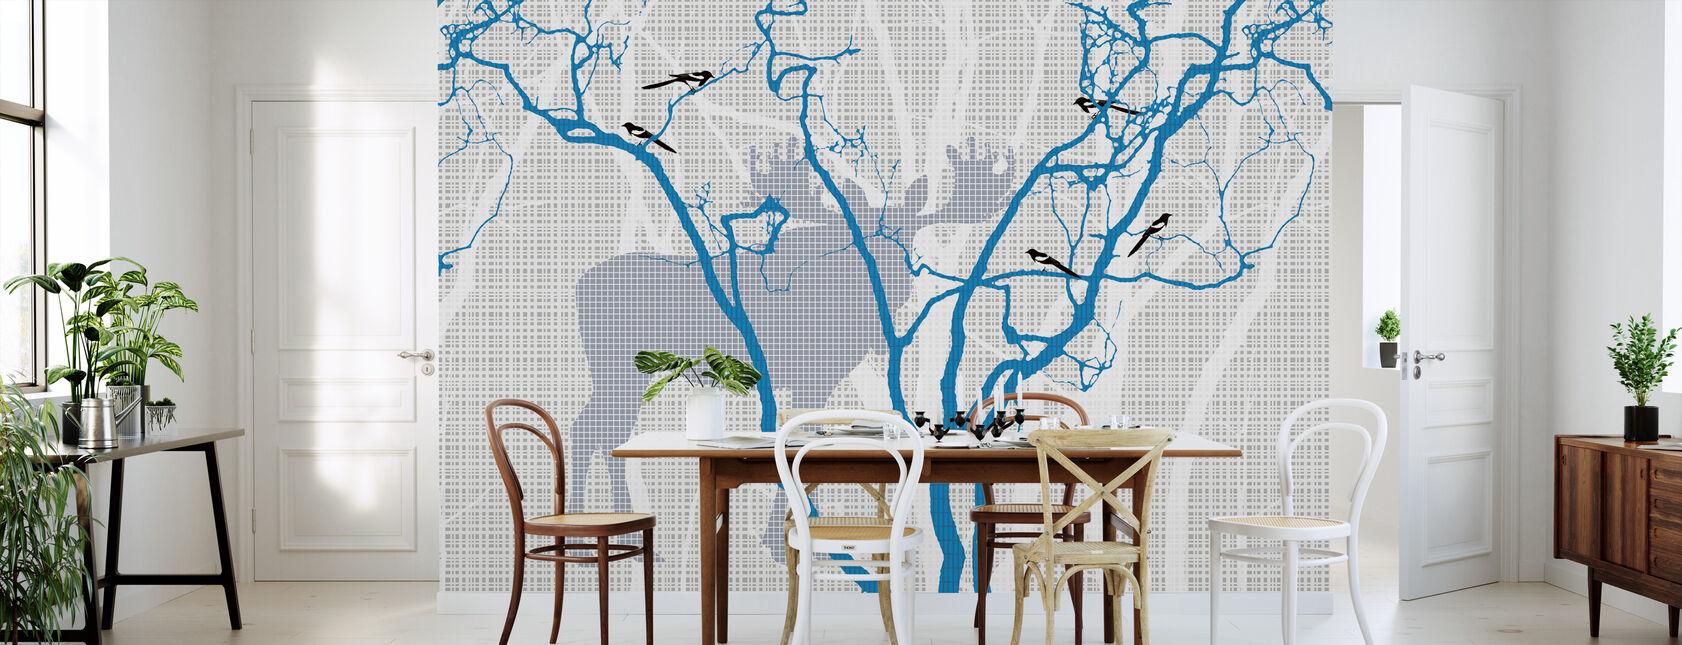 lans d corations murales originales photowall. Black Bedroom Furniture Sets. Home Design Ideas